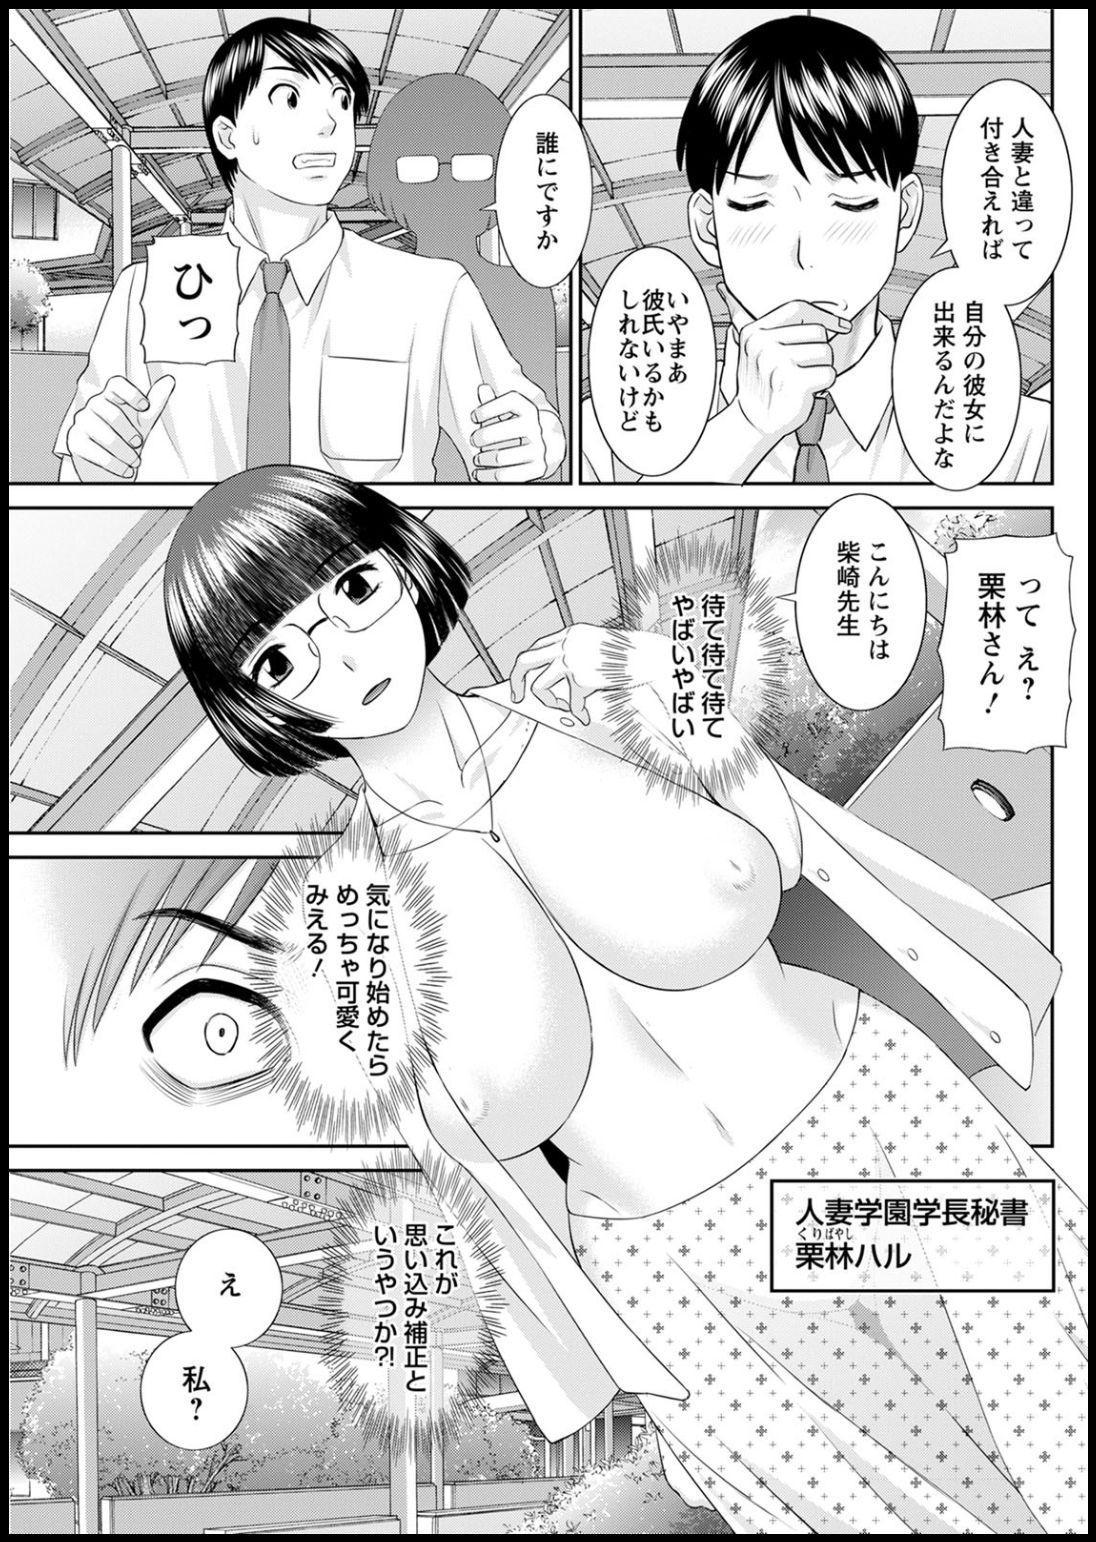 [Kawamori Misaki] Kaikan Hitotsuma Gakuen Ch. 1-6, 8-20 [Digital] 279